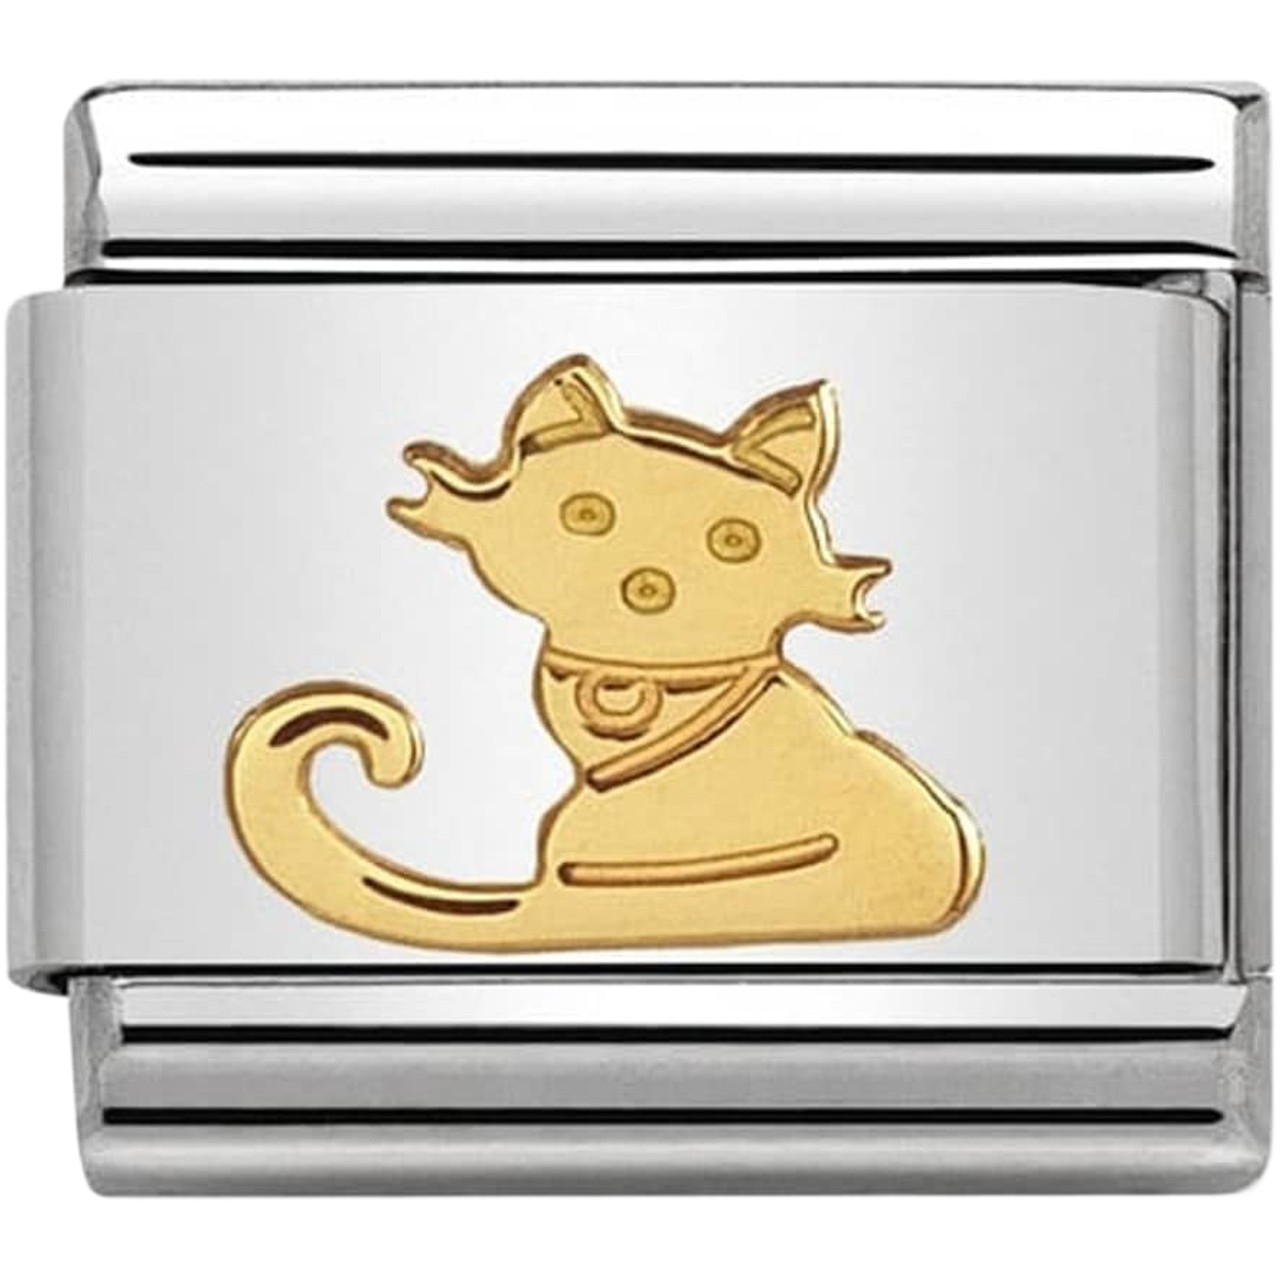 Nomination CLASSIC Gold Zodiac Oval Libra Charm 030165//07 rrp £22